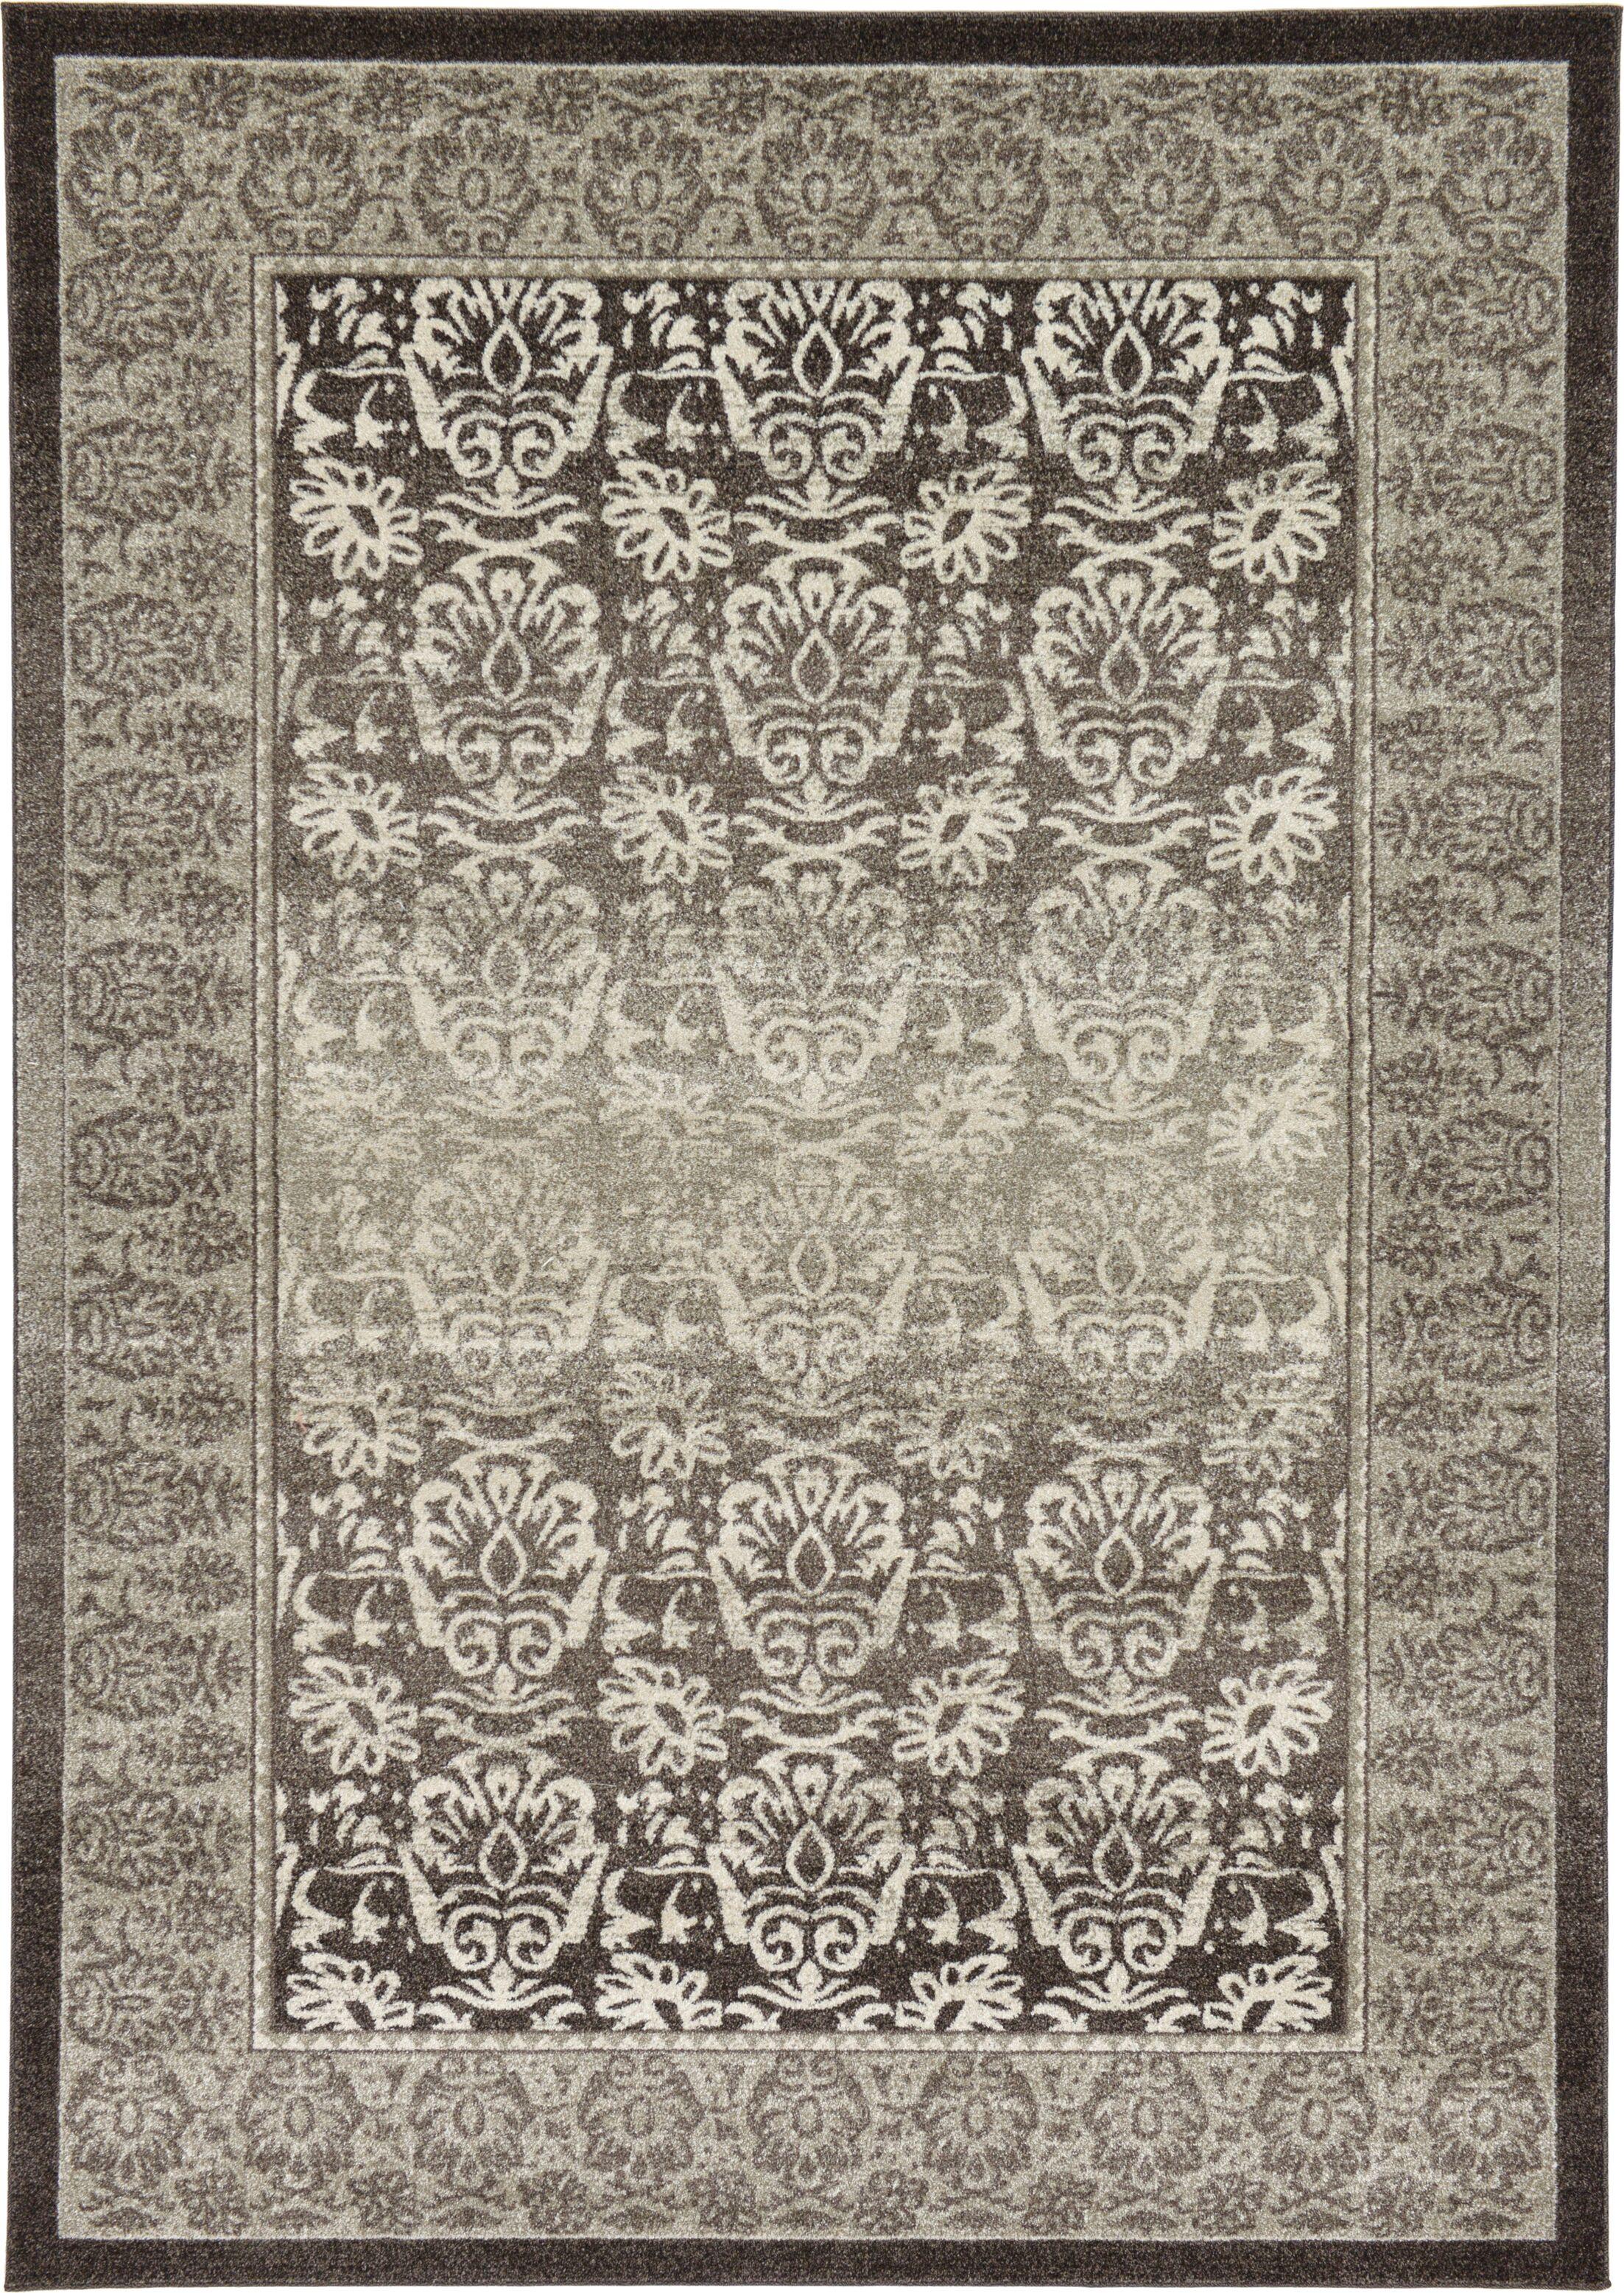 Alexan Brown Area Rug Rug Size: Rectangle 7' x 10'